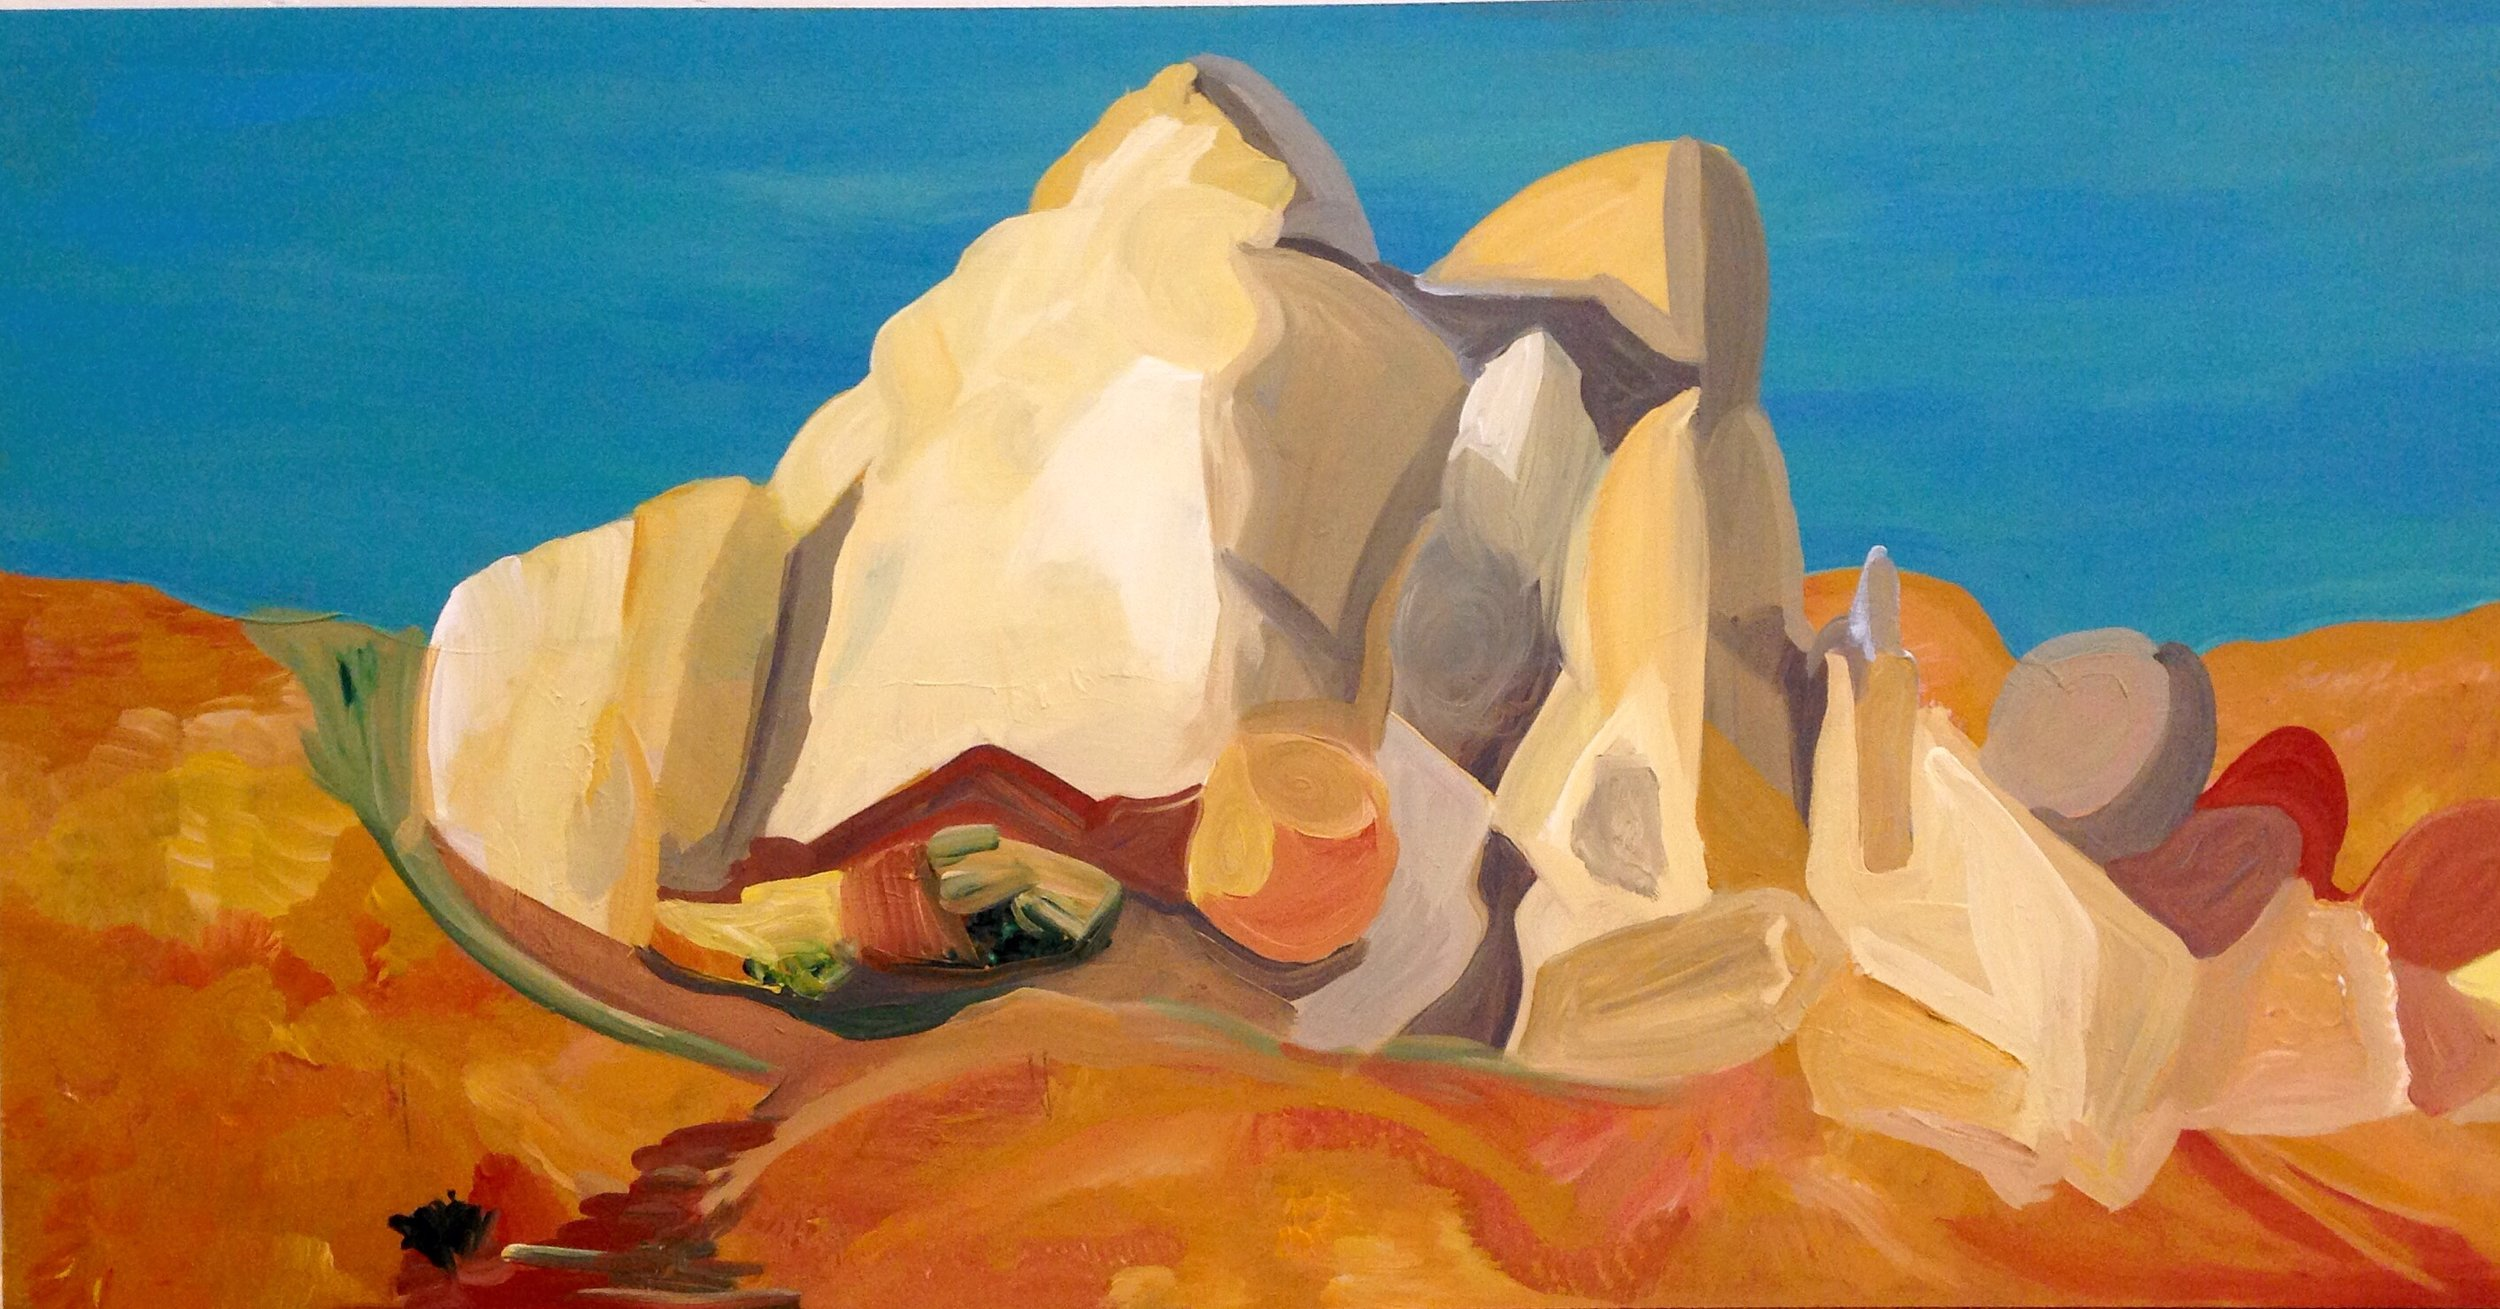 Rendering of Ansel Adams: In Joshua Tree National Monument